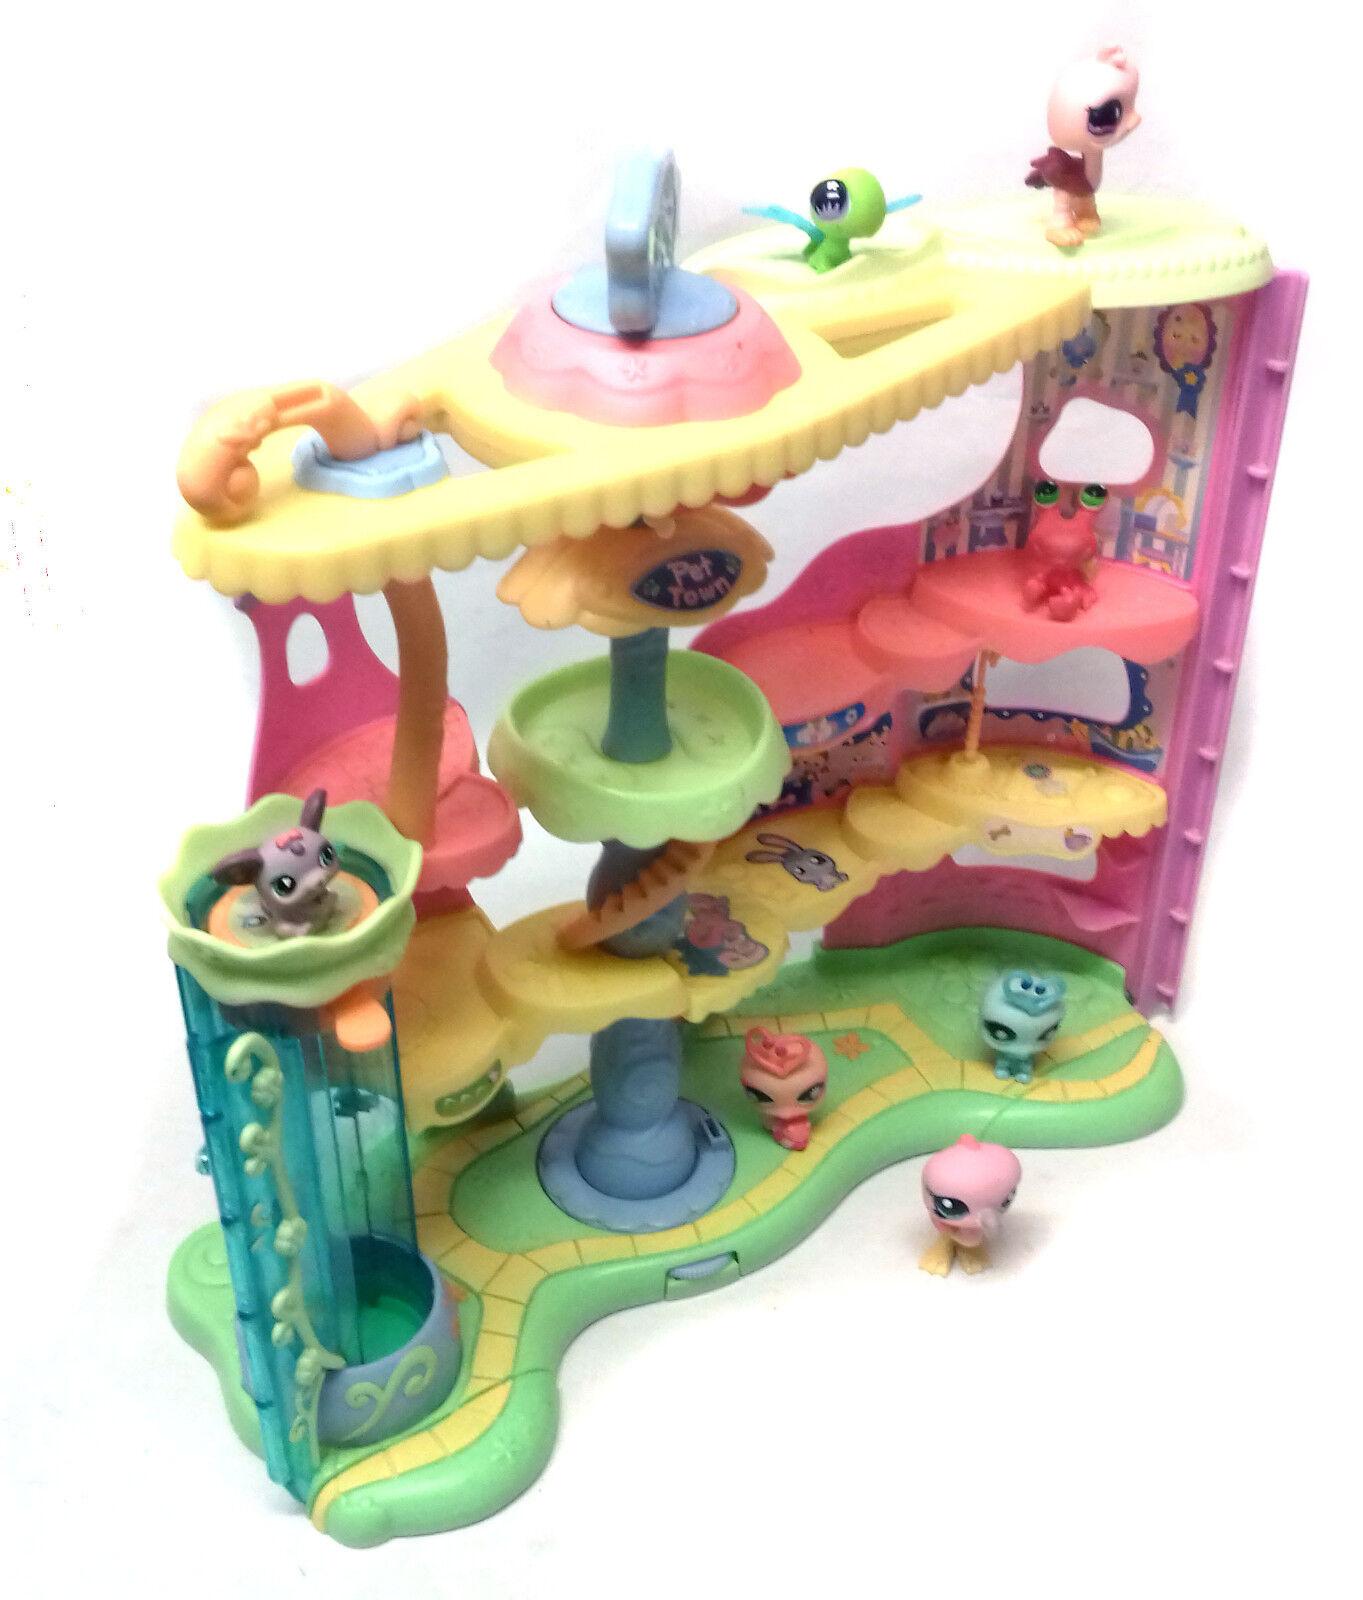 THE LITTLEST PET SHOP Toys Big Playset & Animal figures set lot, cats & dogs